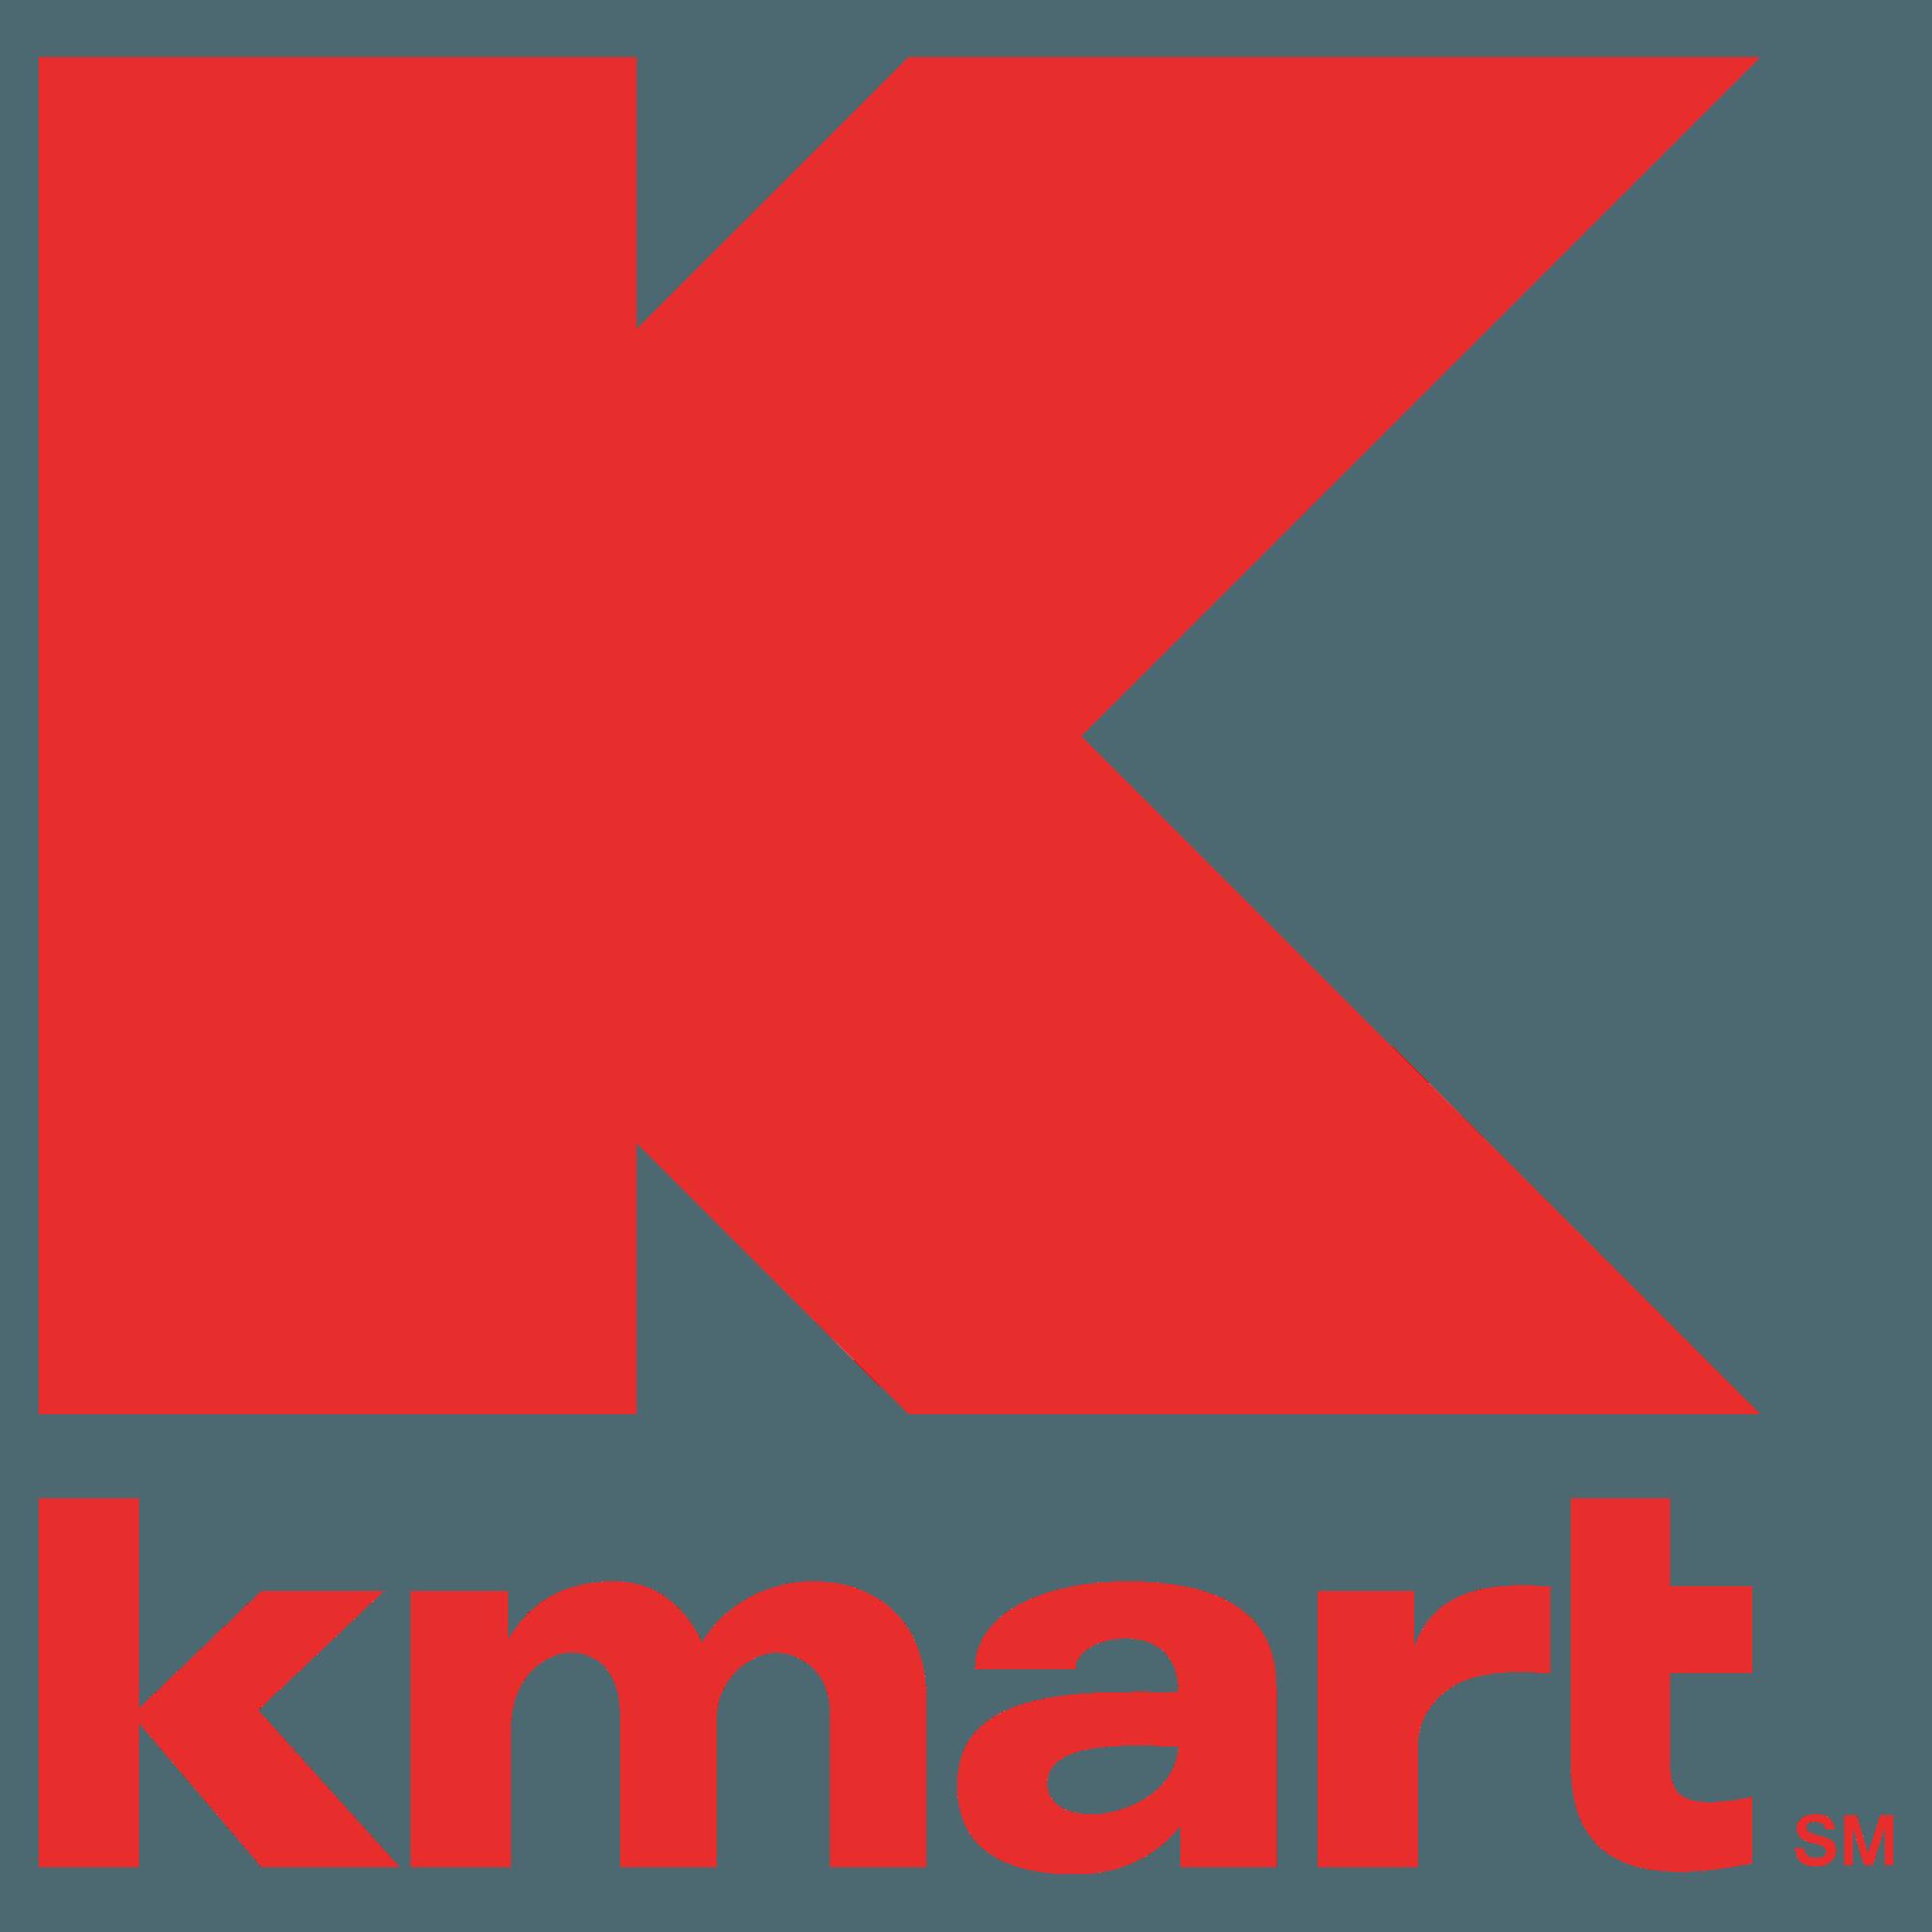 Kmart free cash promotion get 5 in freecash ymmv bookmarktalkfo Images